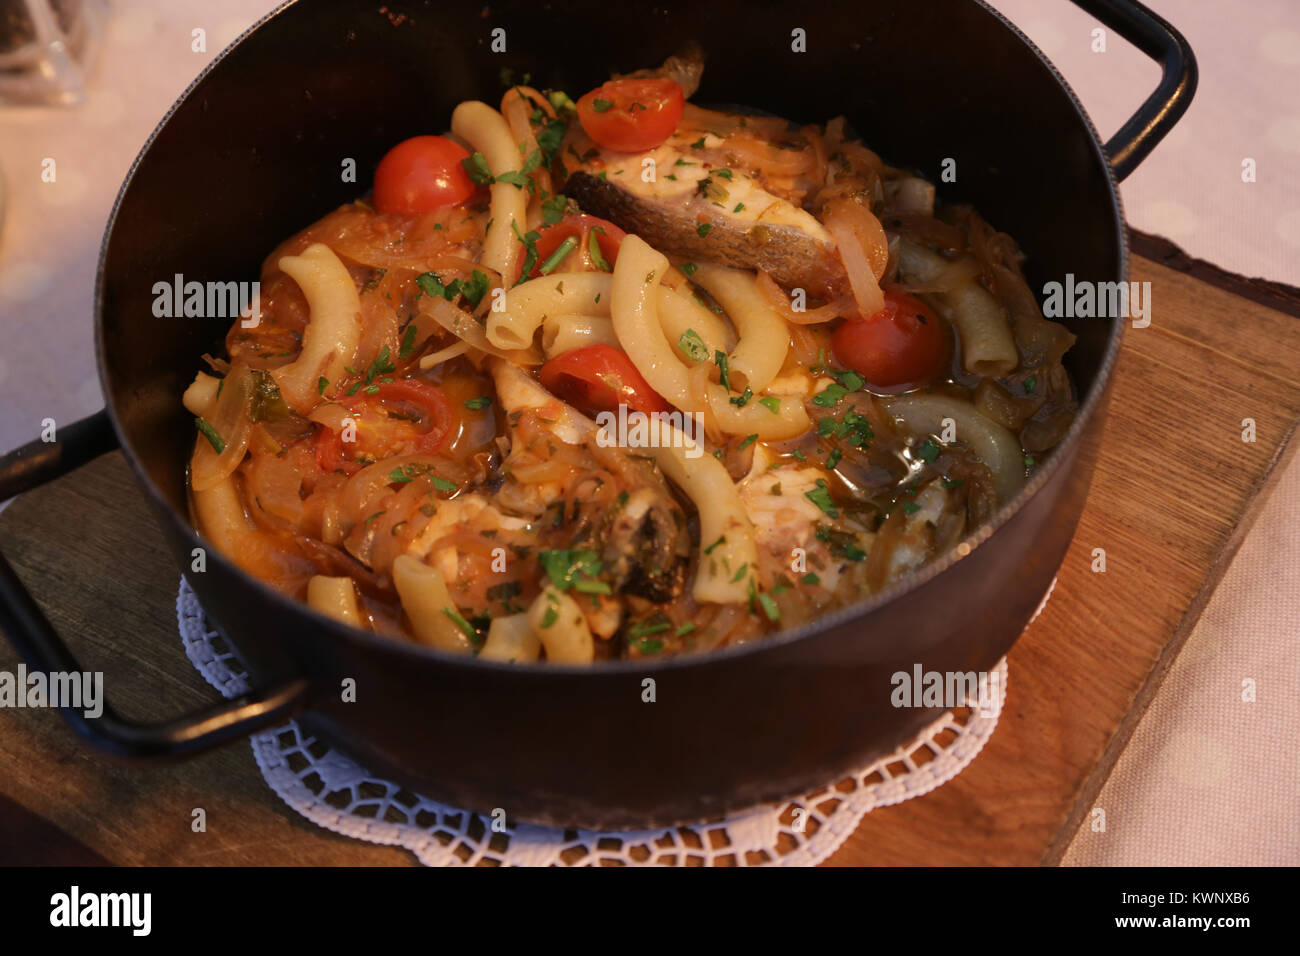 Tećada with sea food and macaroni, traditional Croatian dish - Stock Image